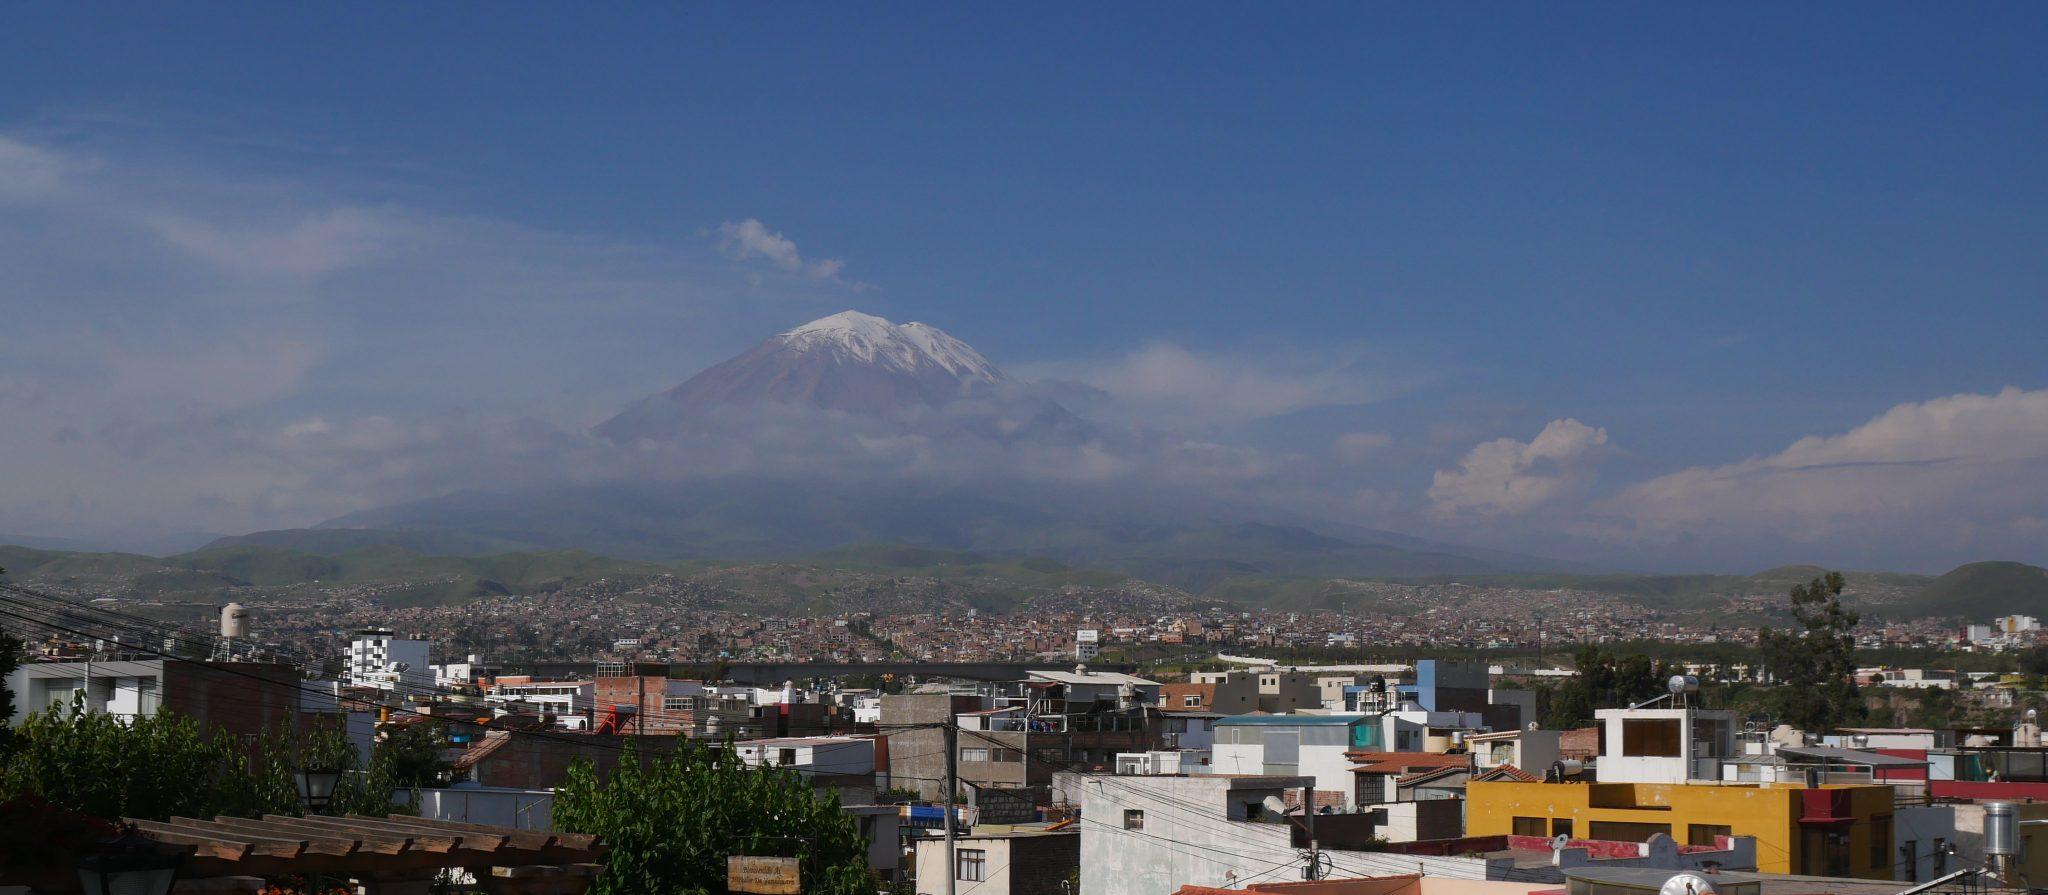 Yunahara Arequipa